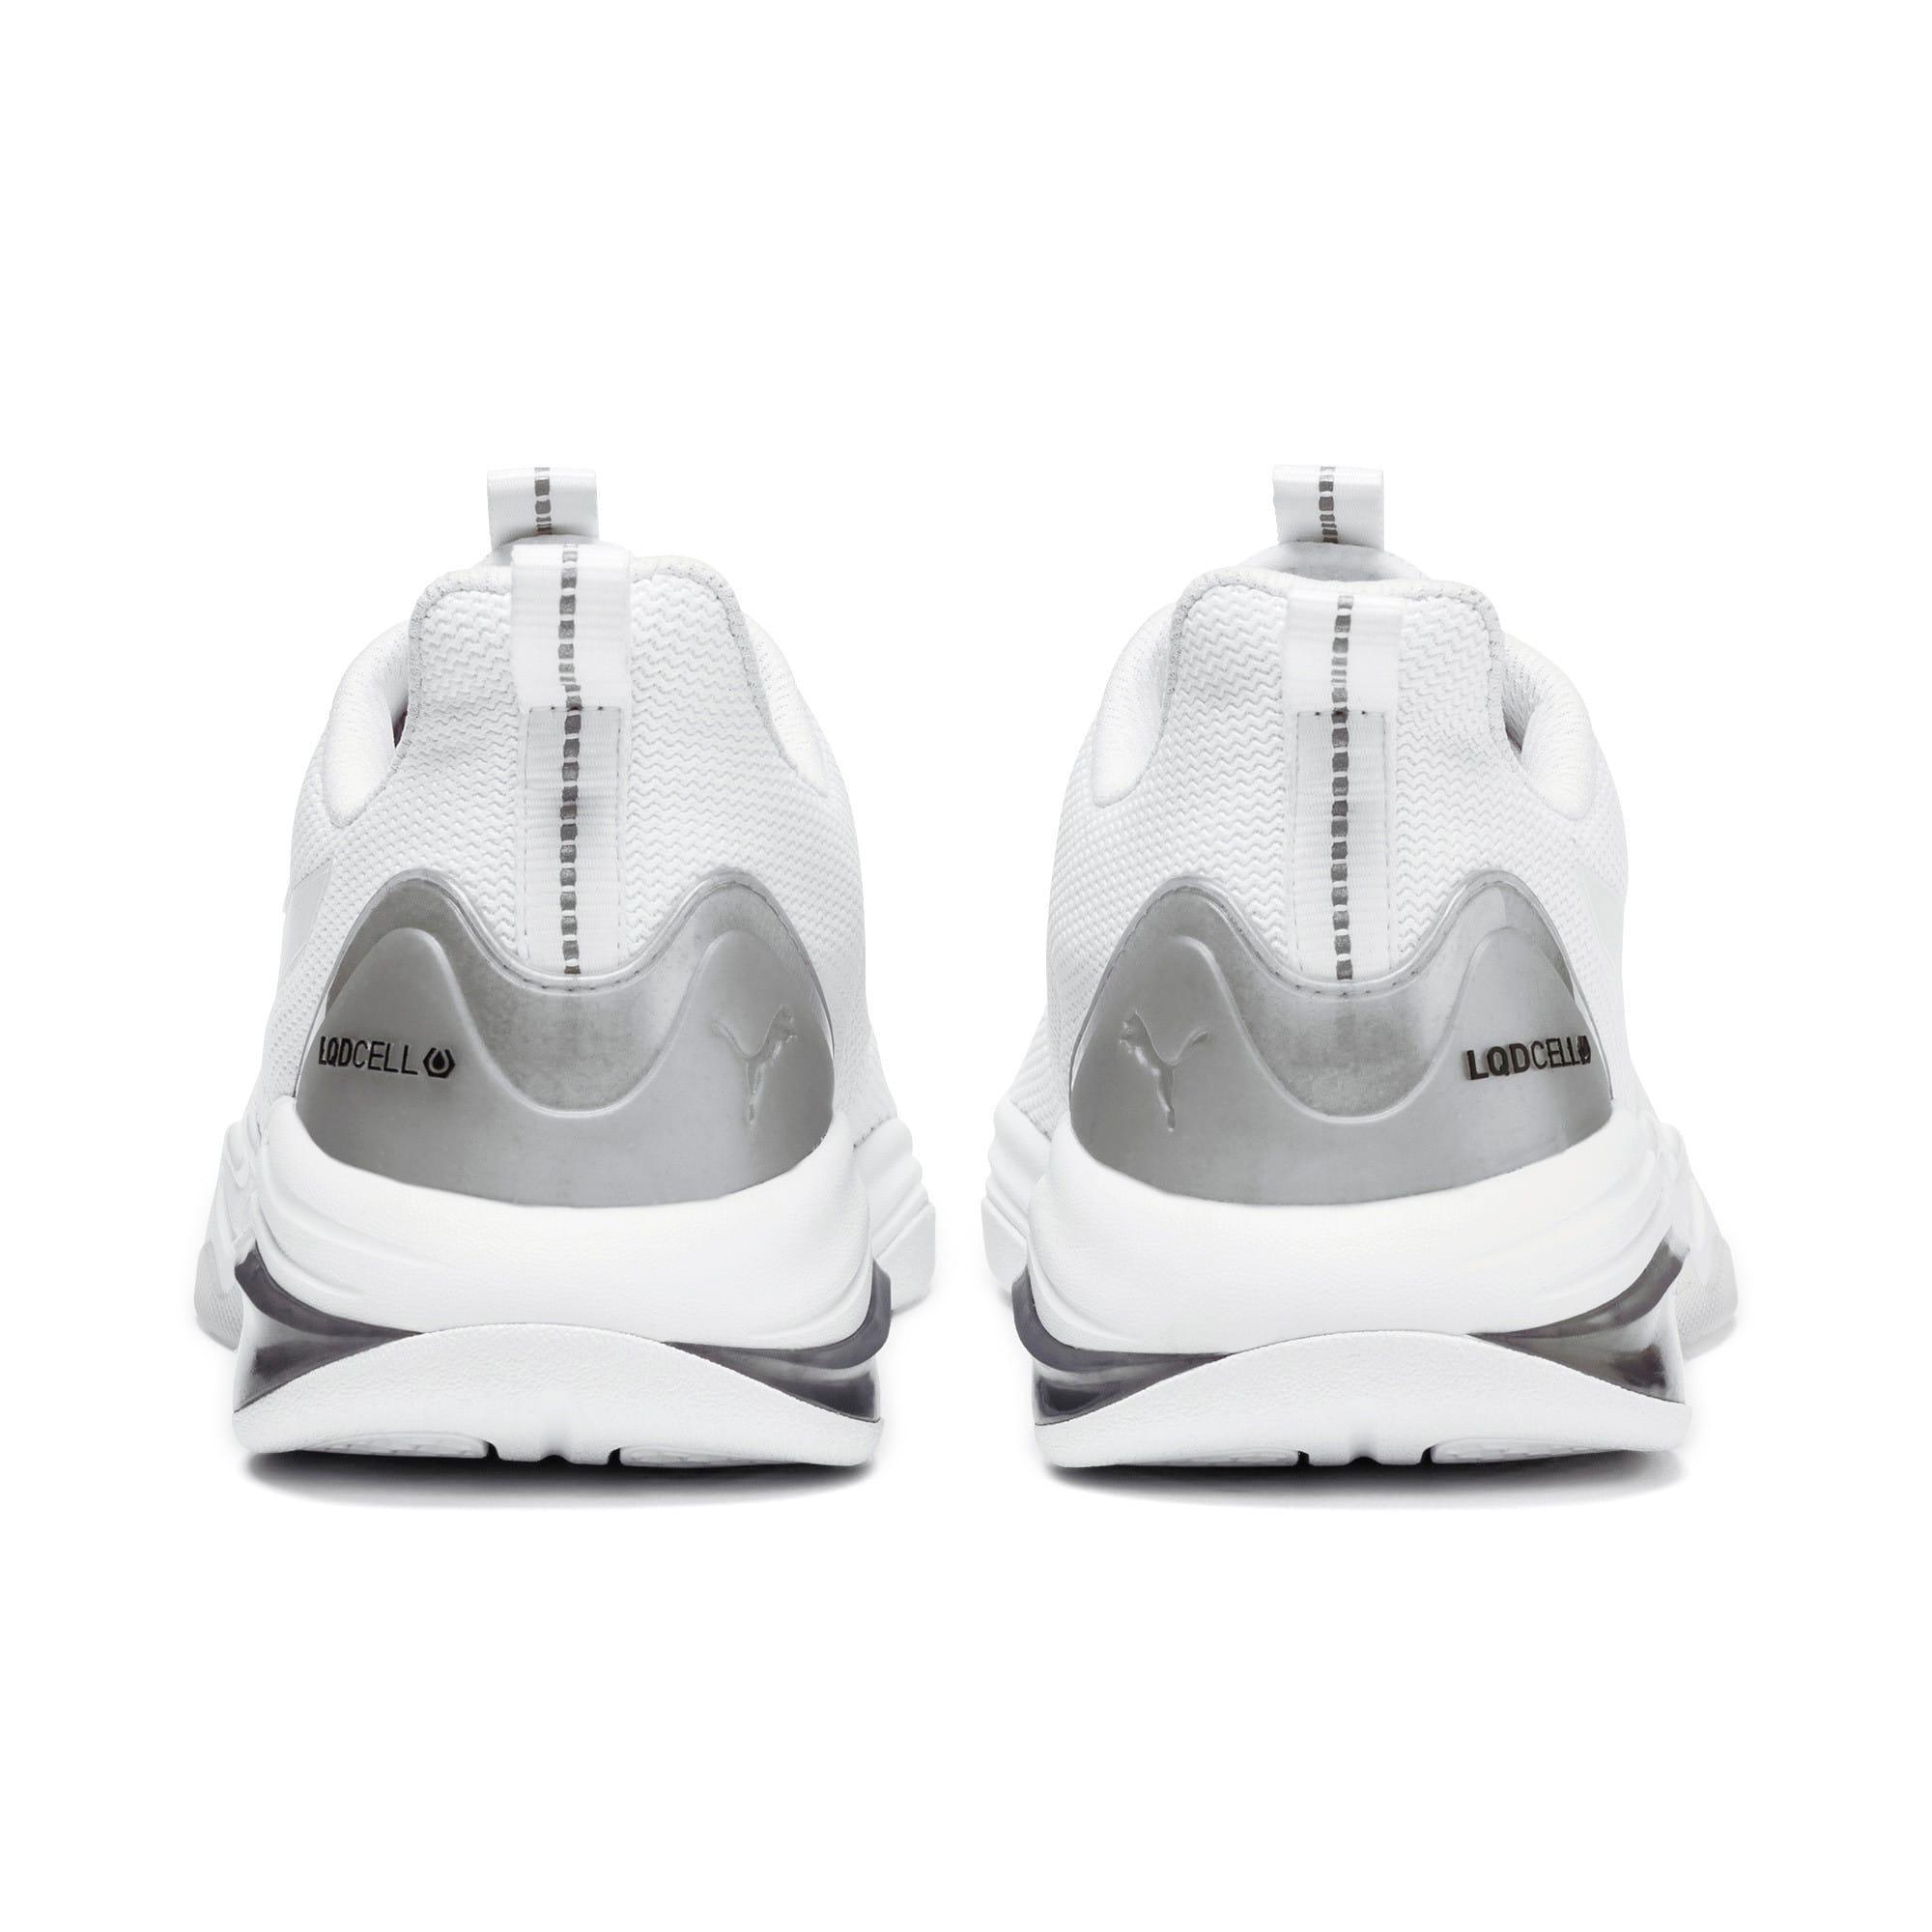 Thumbnail 4 of LQDCELL Tension Lights Men's Training Shoes, Puma White-Puma Silver, medium